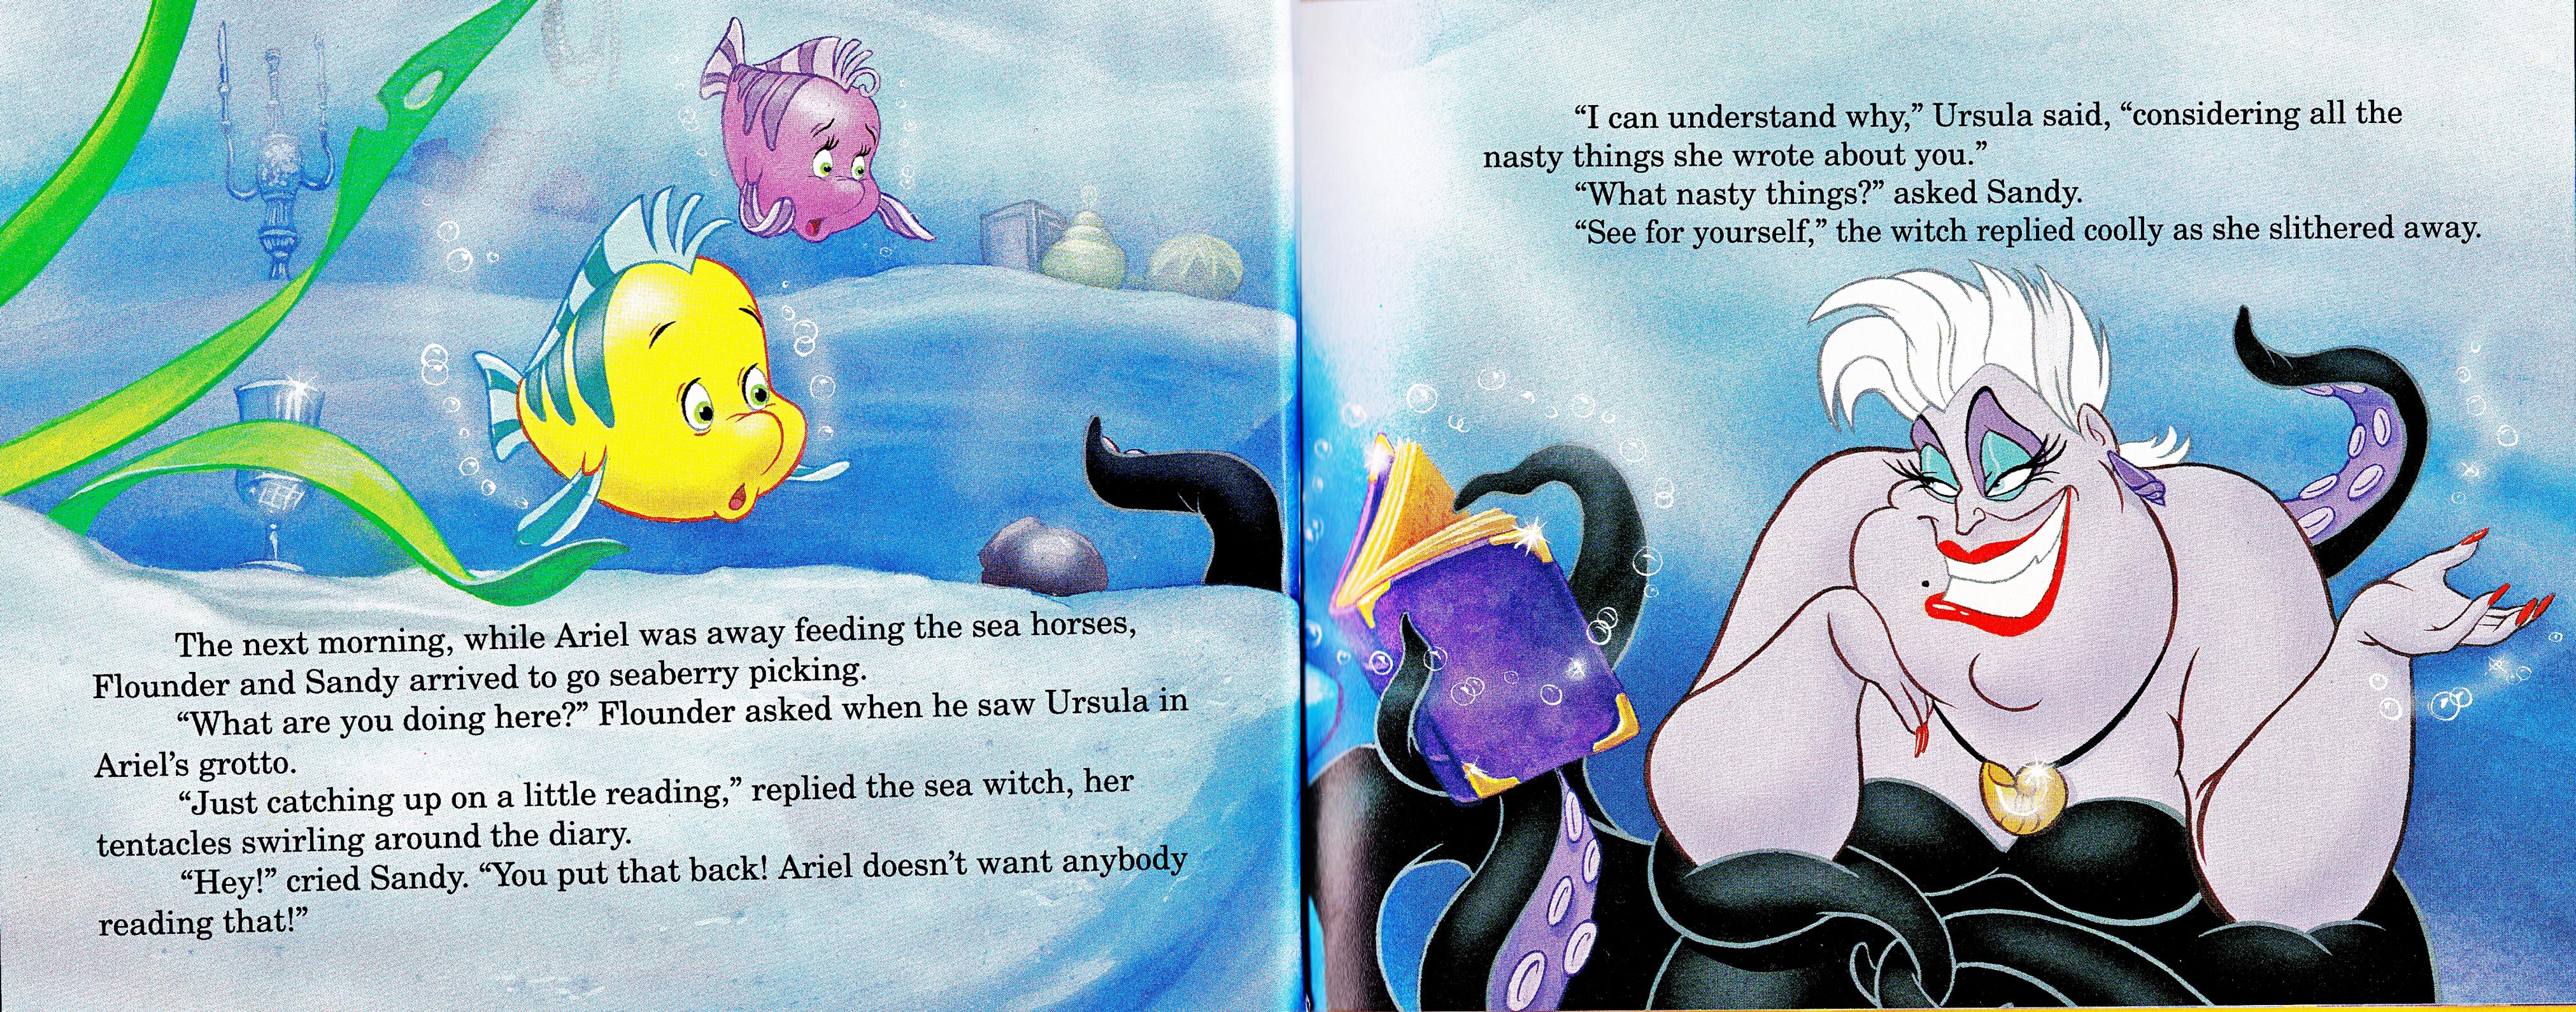 Walt Disney Book Scans - The Little Mermaid's Treasure Chest: Dear Diary